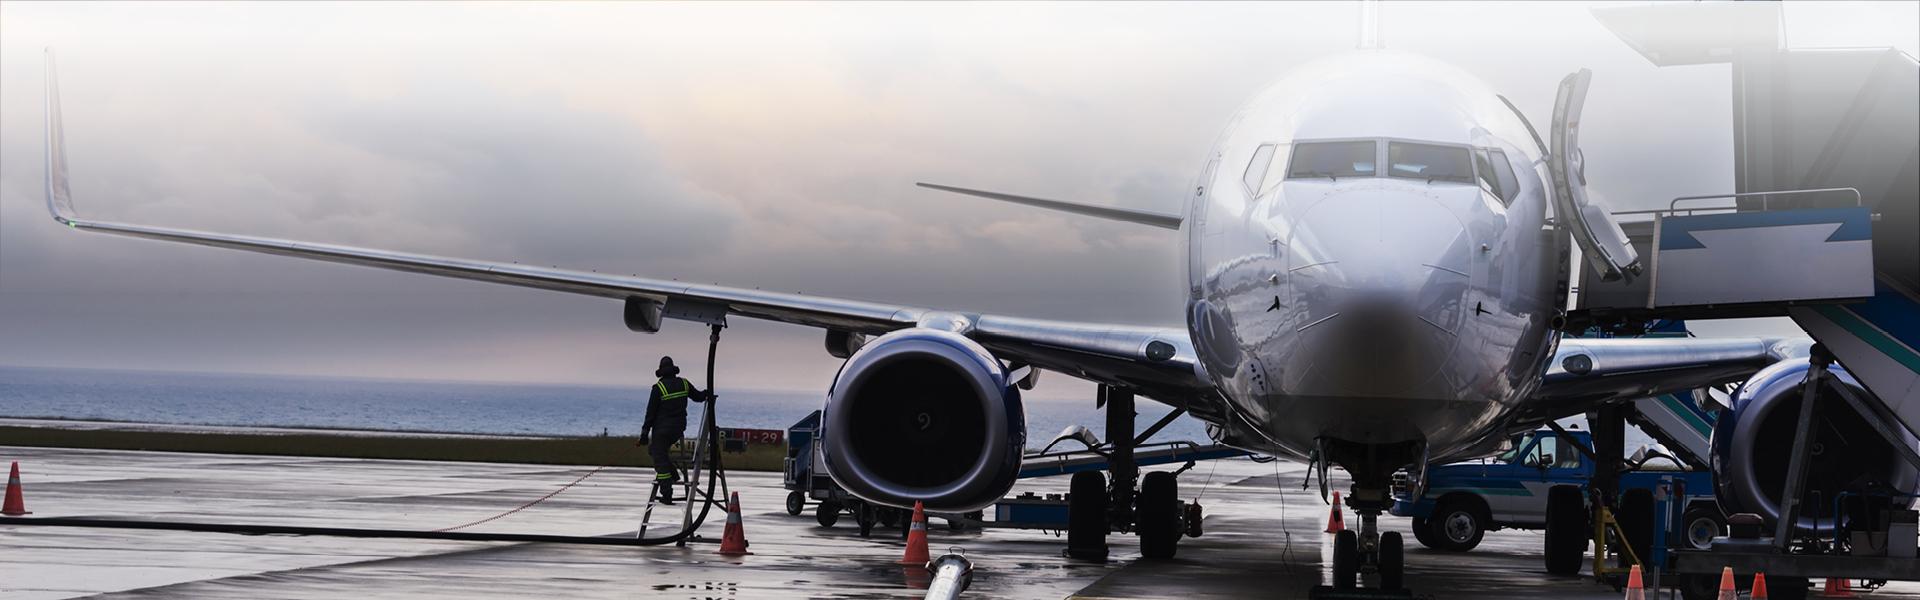 Kerosene And Jet Fuel Purification Aviation Filters Cla Refueling Plane Header